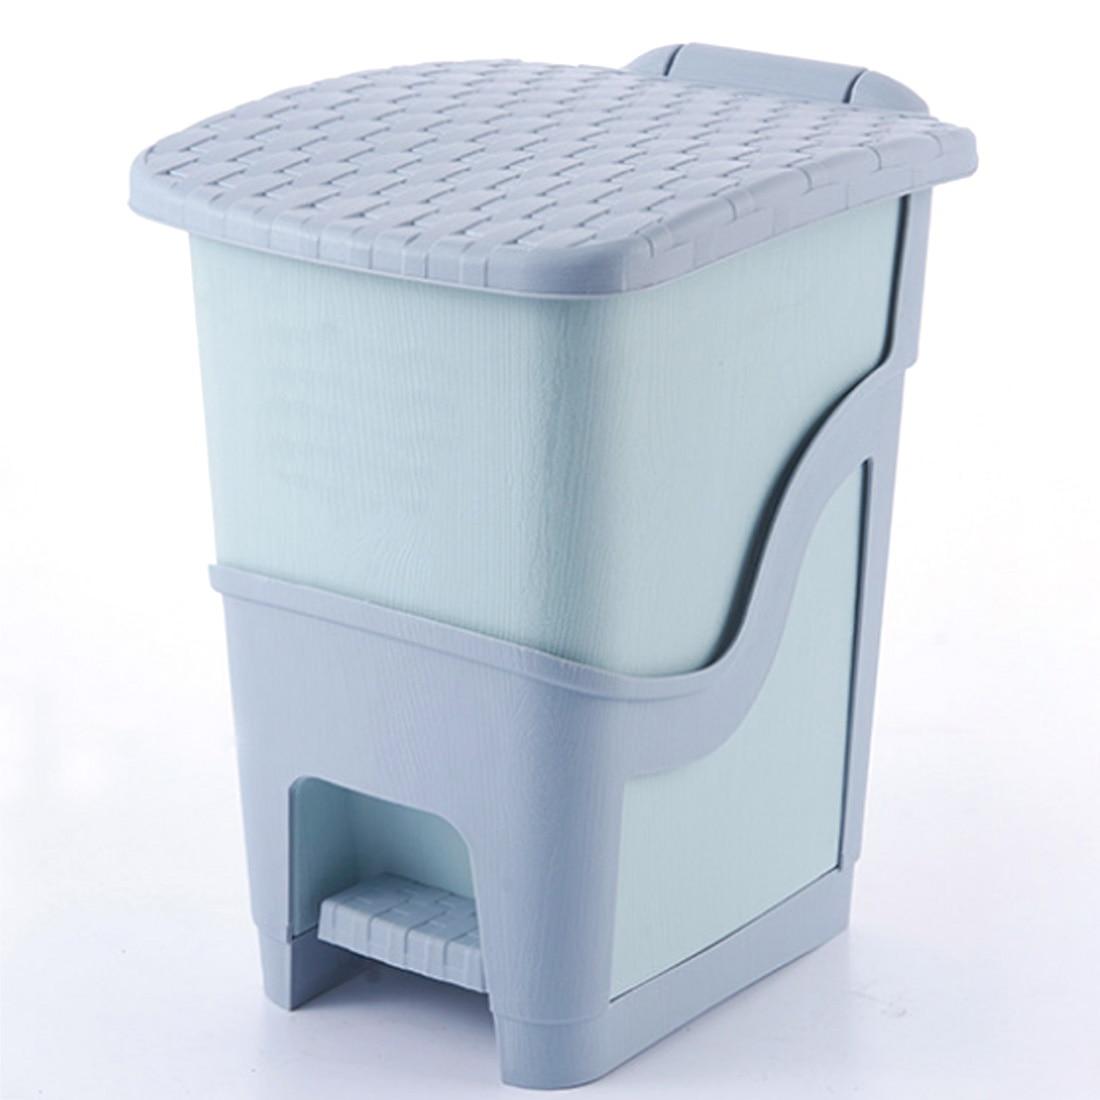 2018 New Hot 8L Size S Foot Pedal Type Waste Bin Garbage Case Trash ...